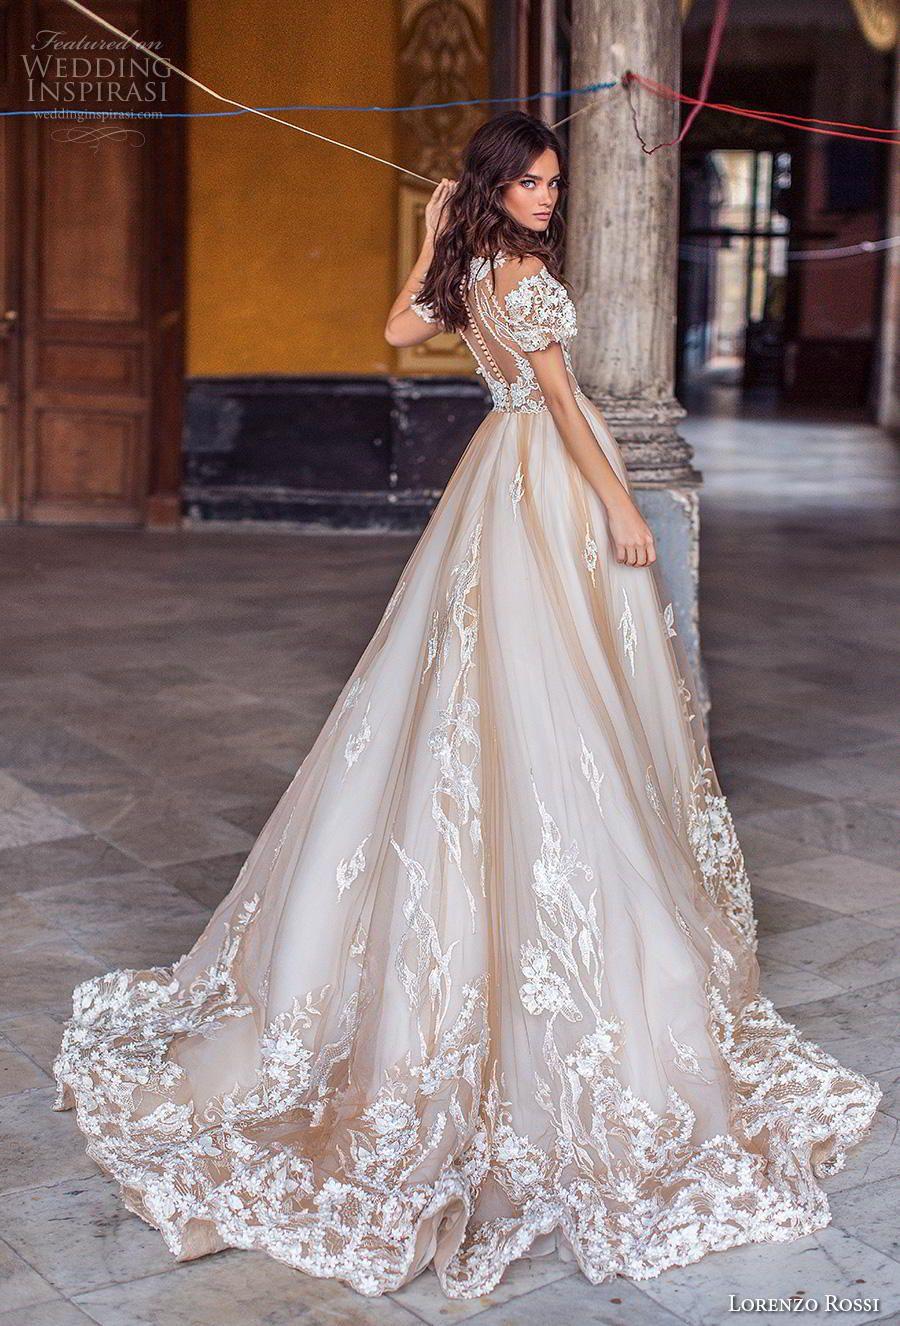 Lorenzo rossi wedding dresses u uchavanaud bridal campaign in